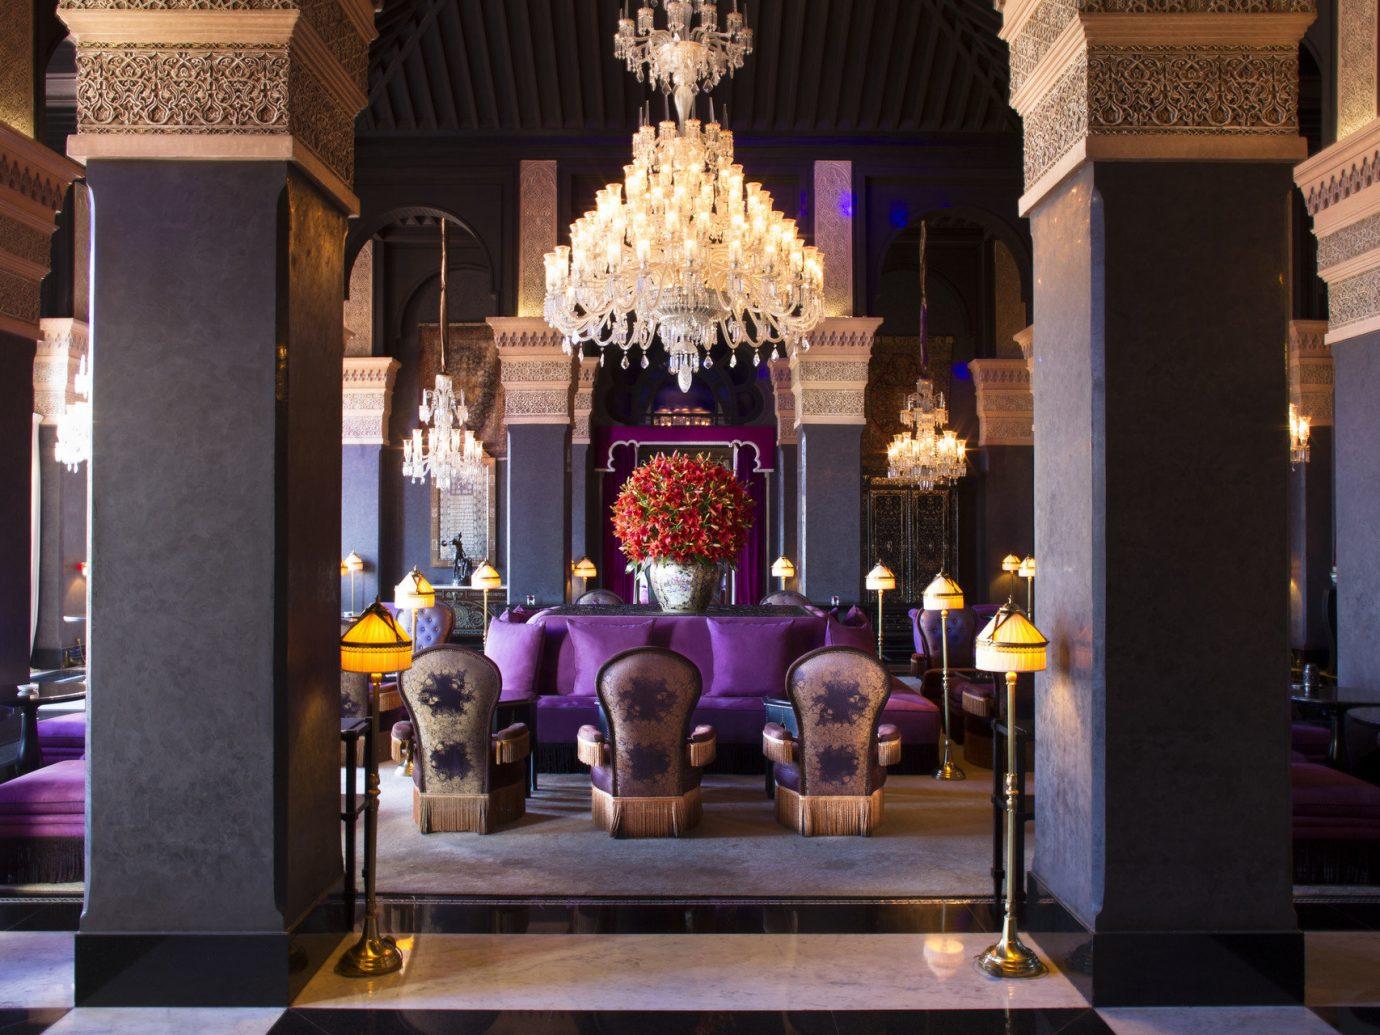 ambient lighting columns Elegant extravagant fancy Hotels interior living area living room Lounge regal sophisticated Style + Design lighting altar